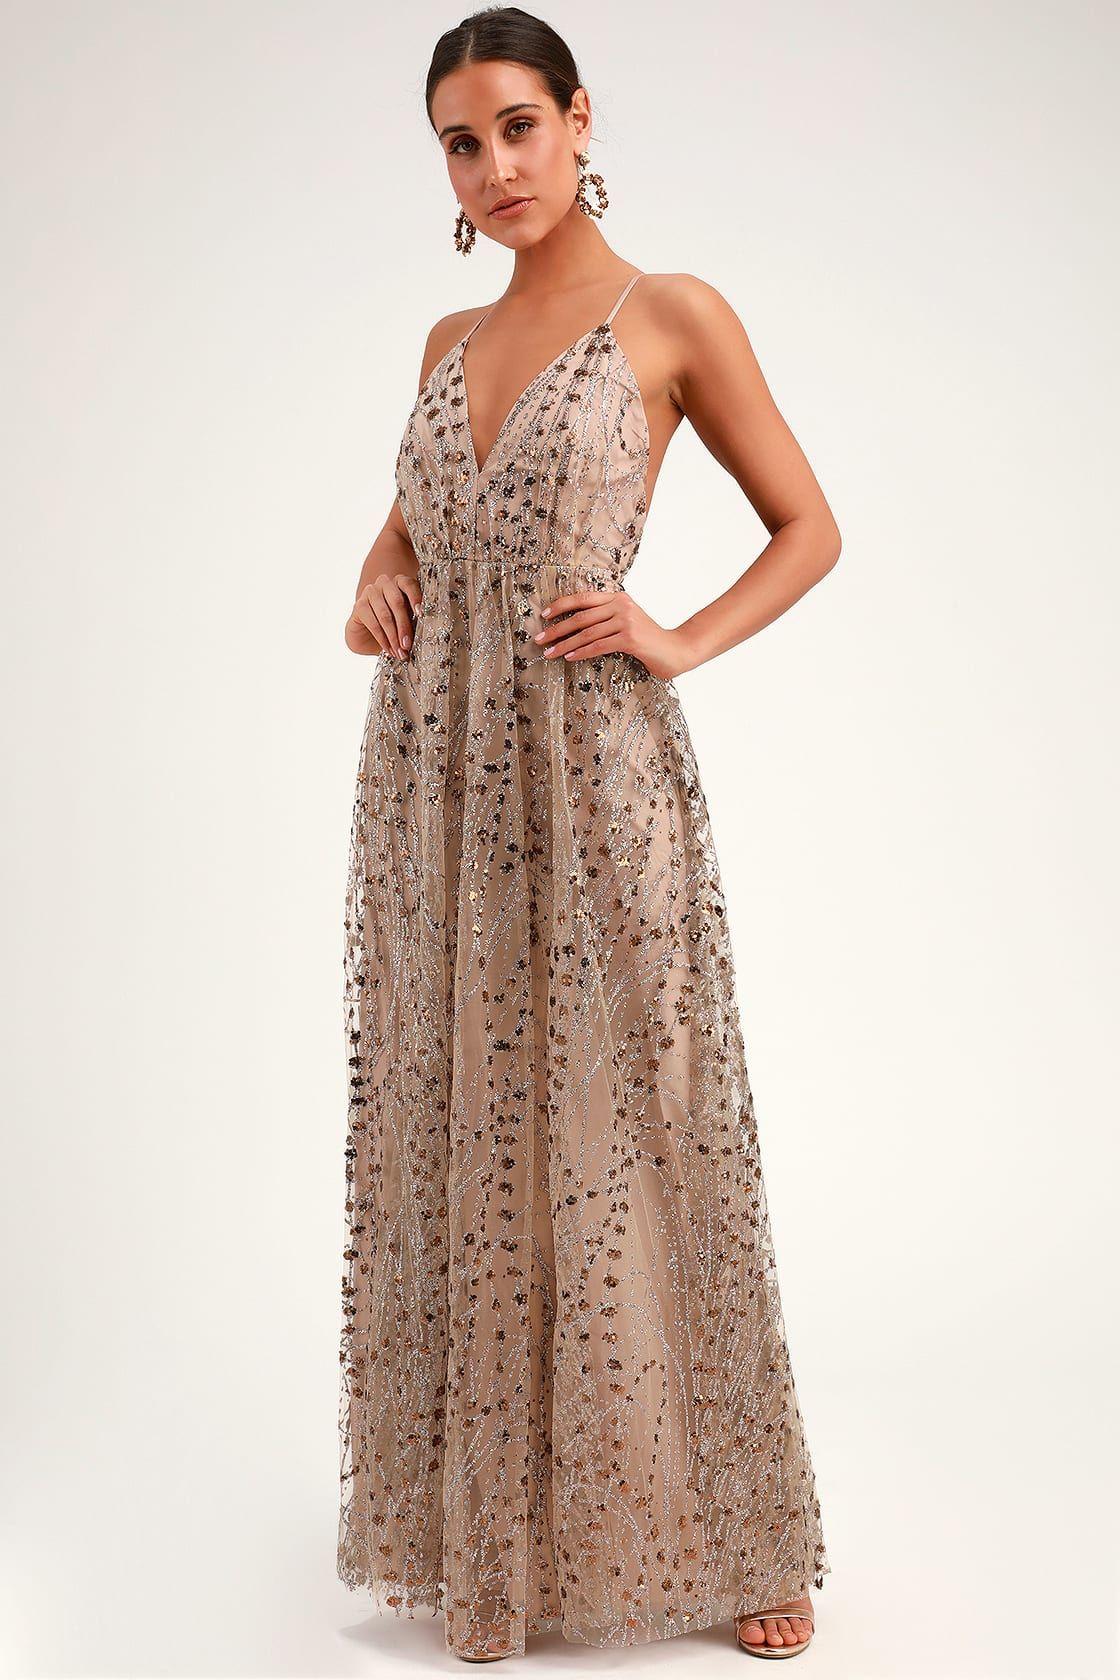 Luminous Night Taupe Glitter Sequin Maxi Dress Sequin Maxi Dress Maxi Dress Lace Maxi Dress